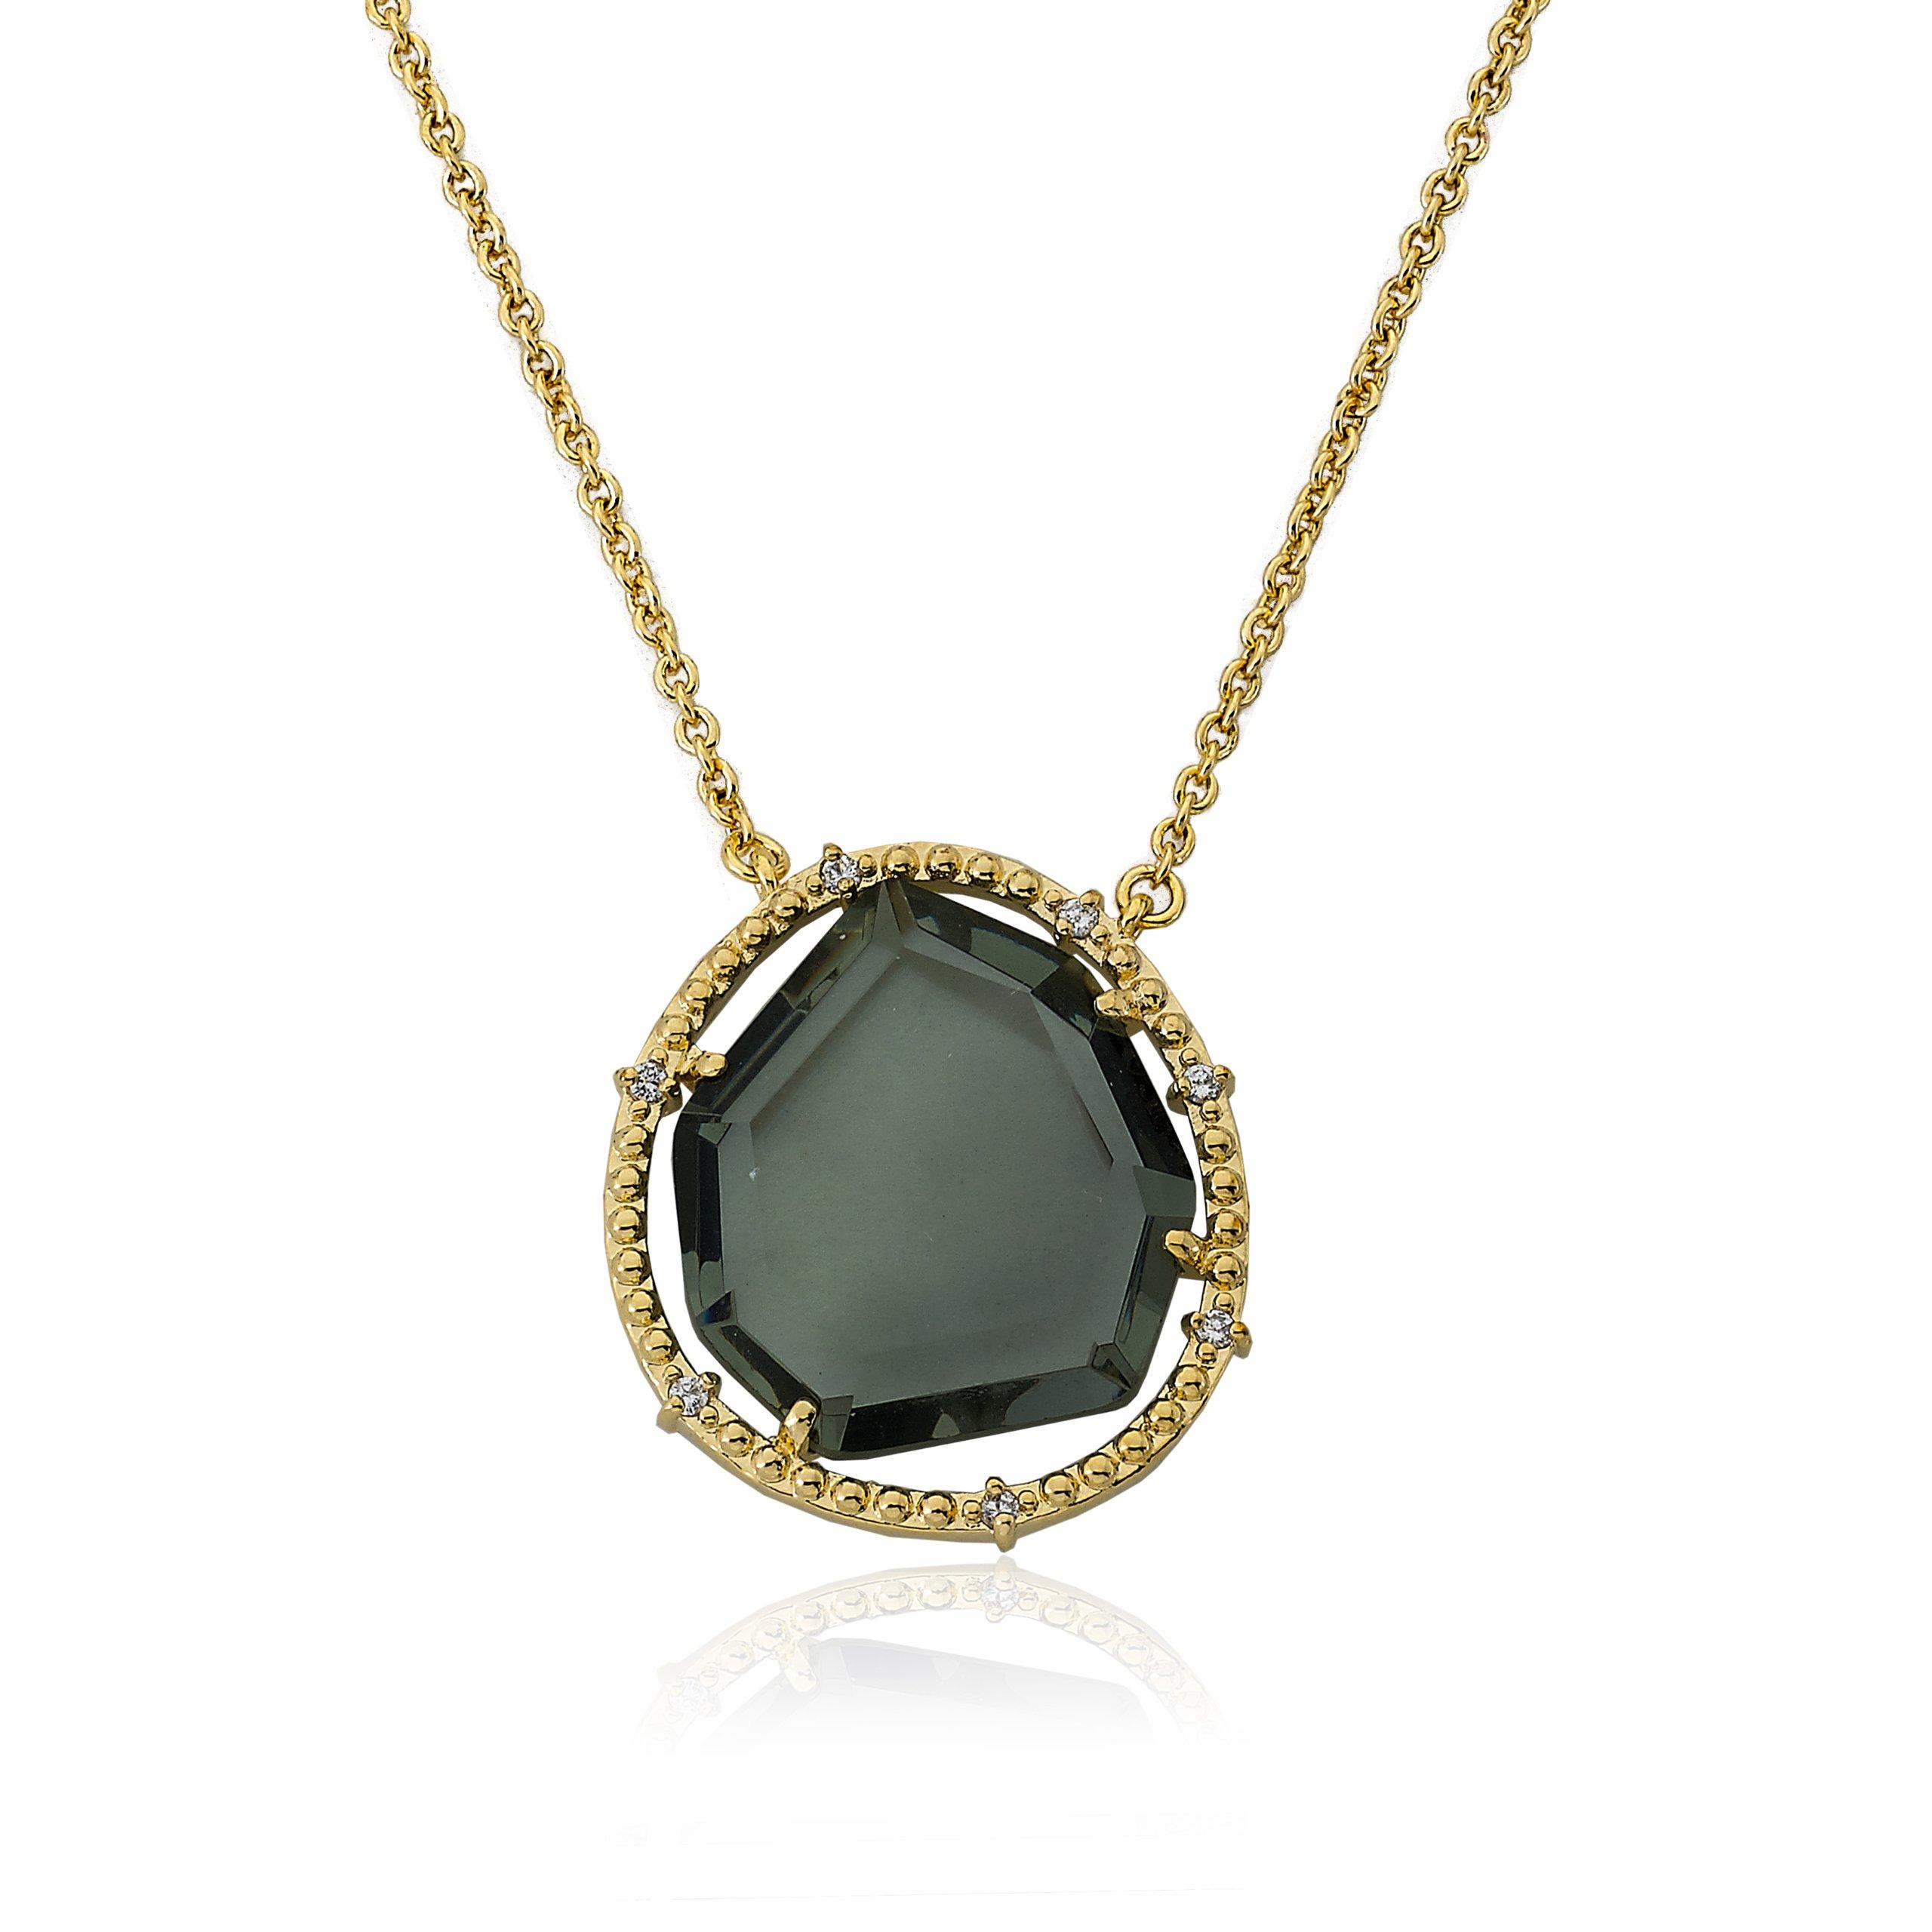 Riccova Sliced Glass 14k Gold-Plated Black Sliced Glass Pendant Chain Necklace 16''/2'' by Riccova